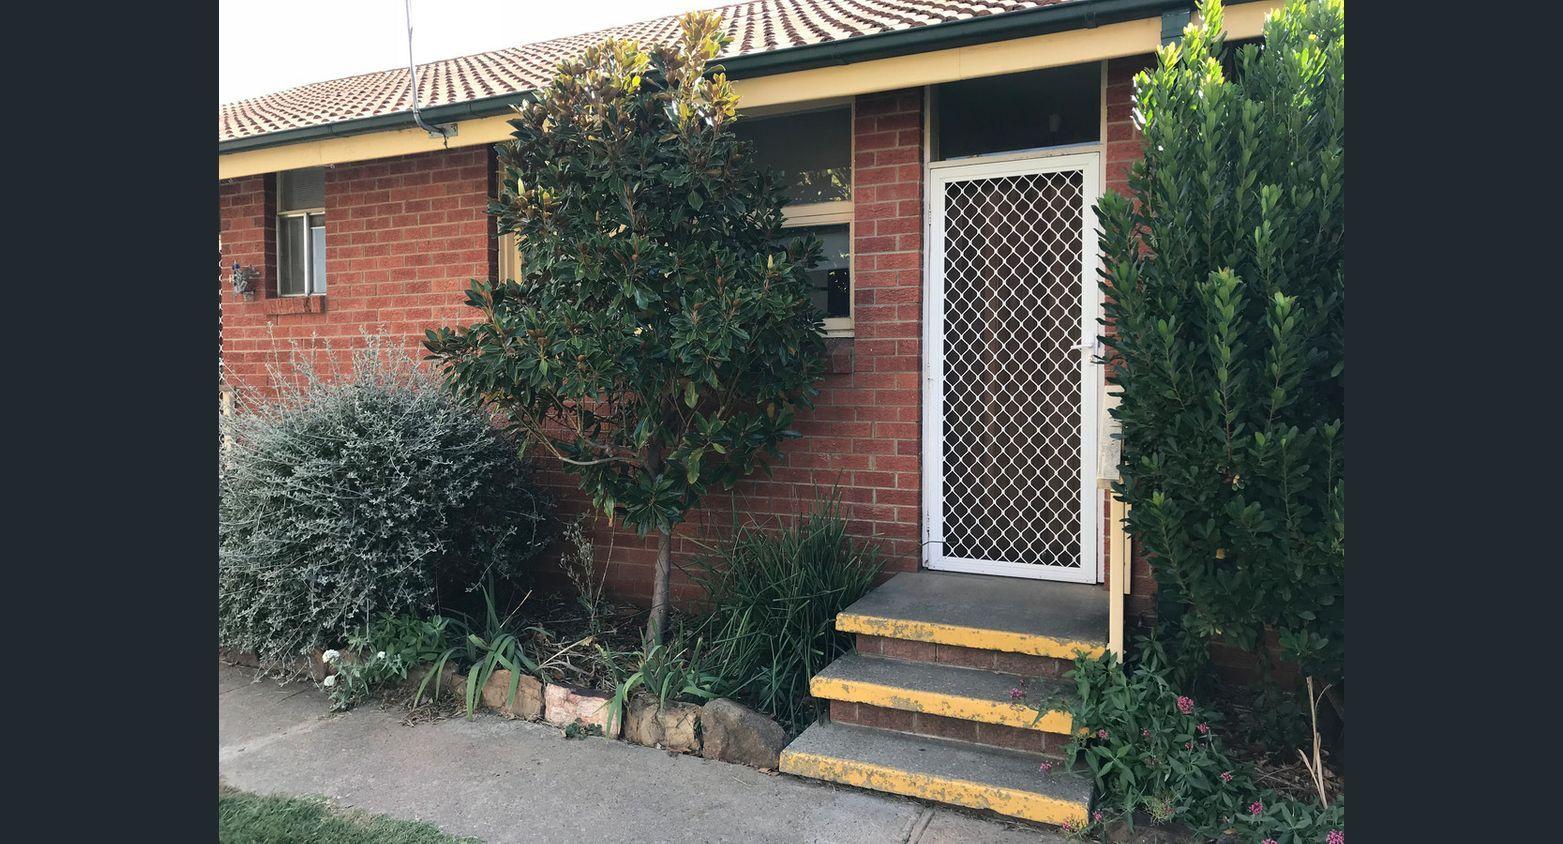 13/24 Mittagang Road, Cooma NSW 2630, Image 0